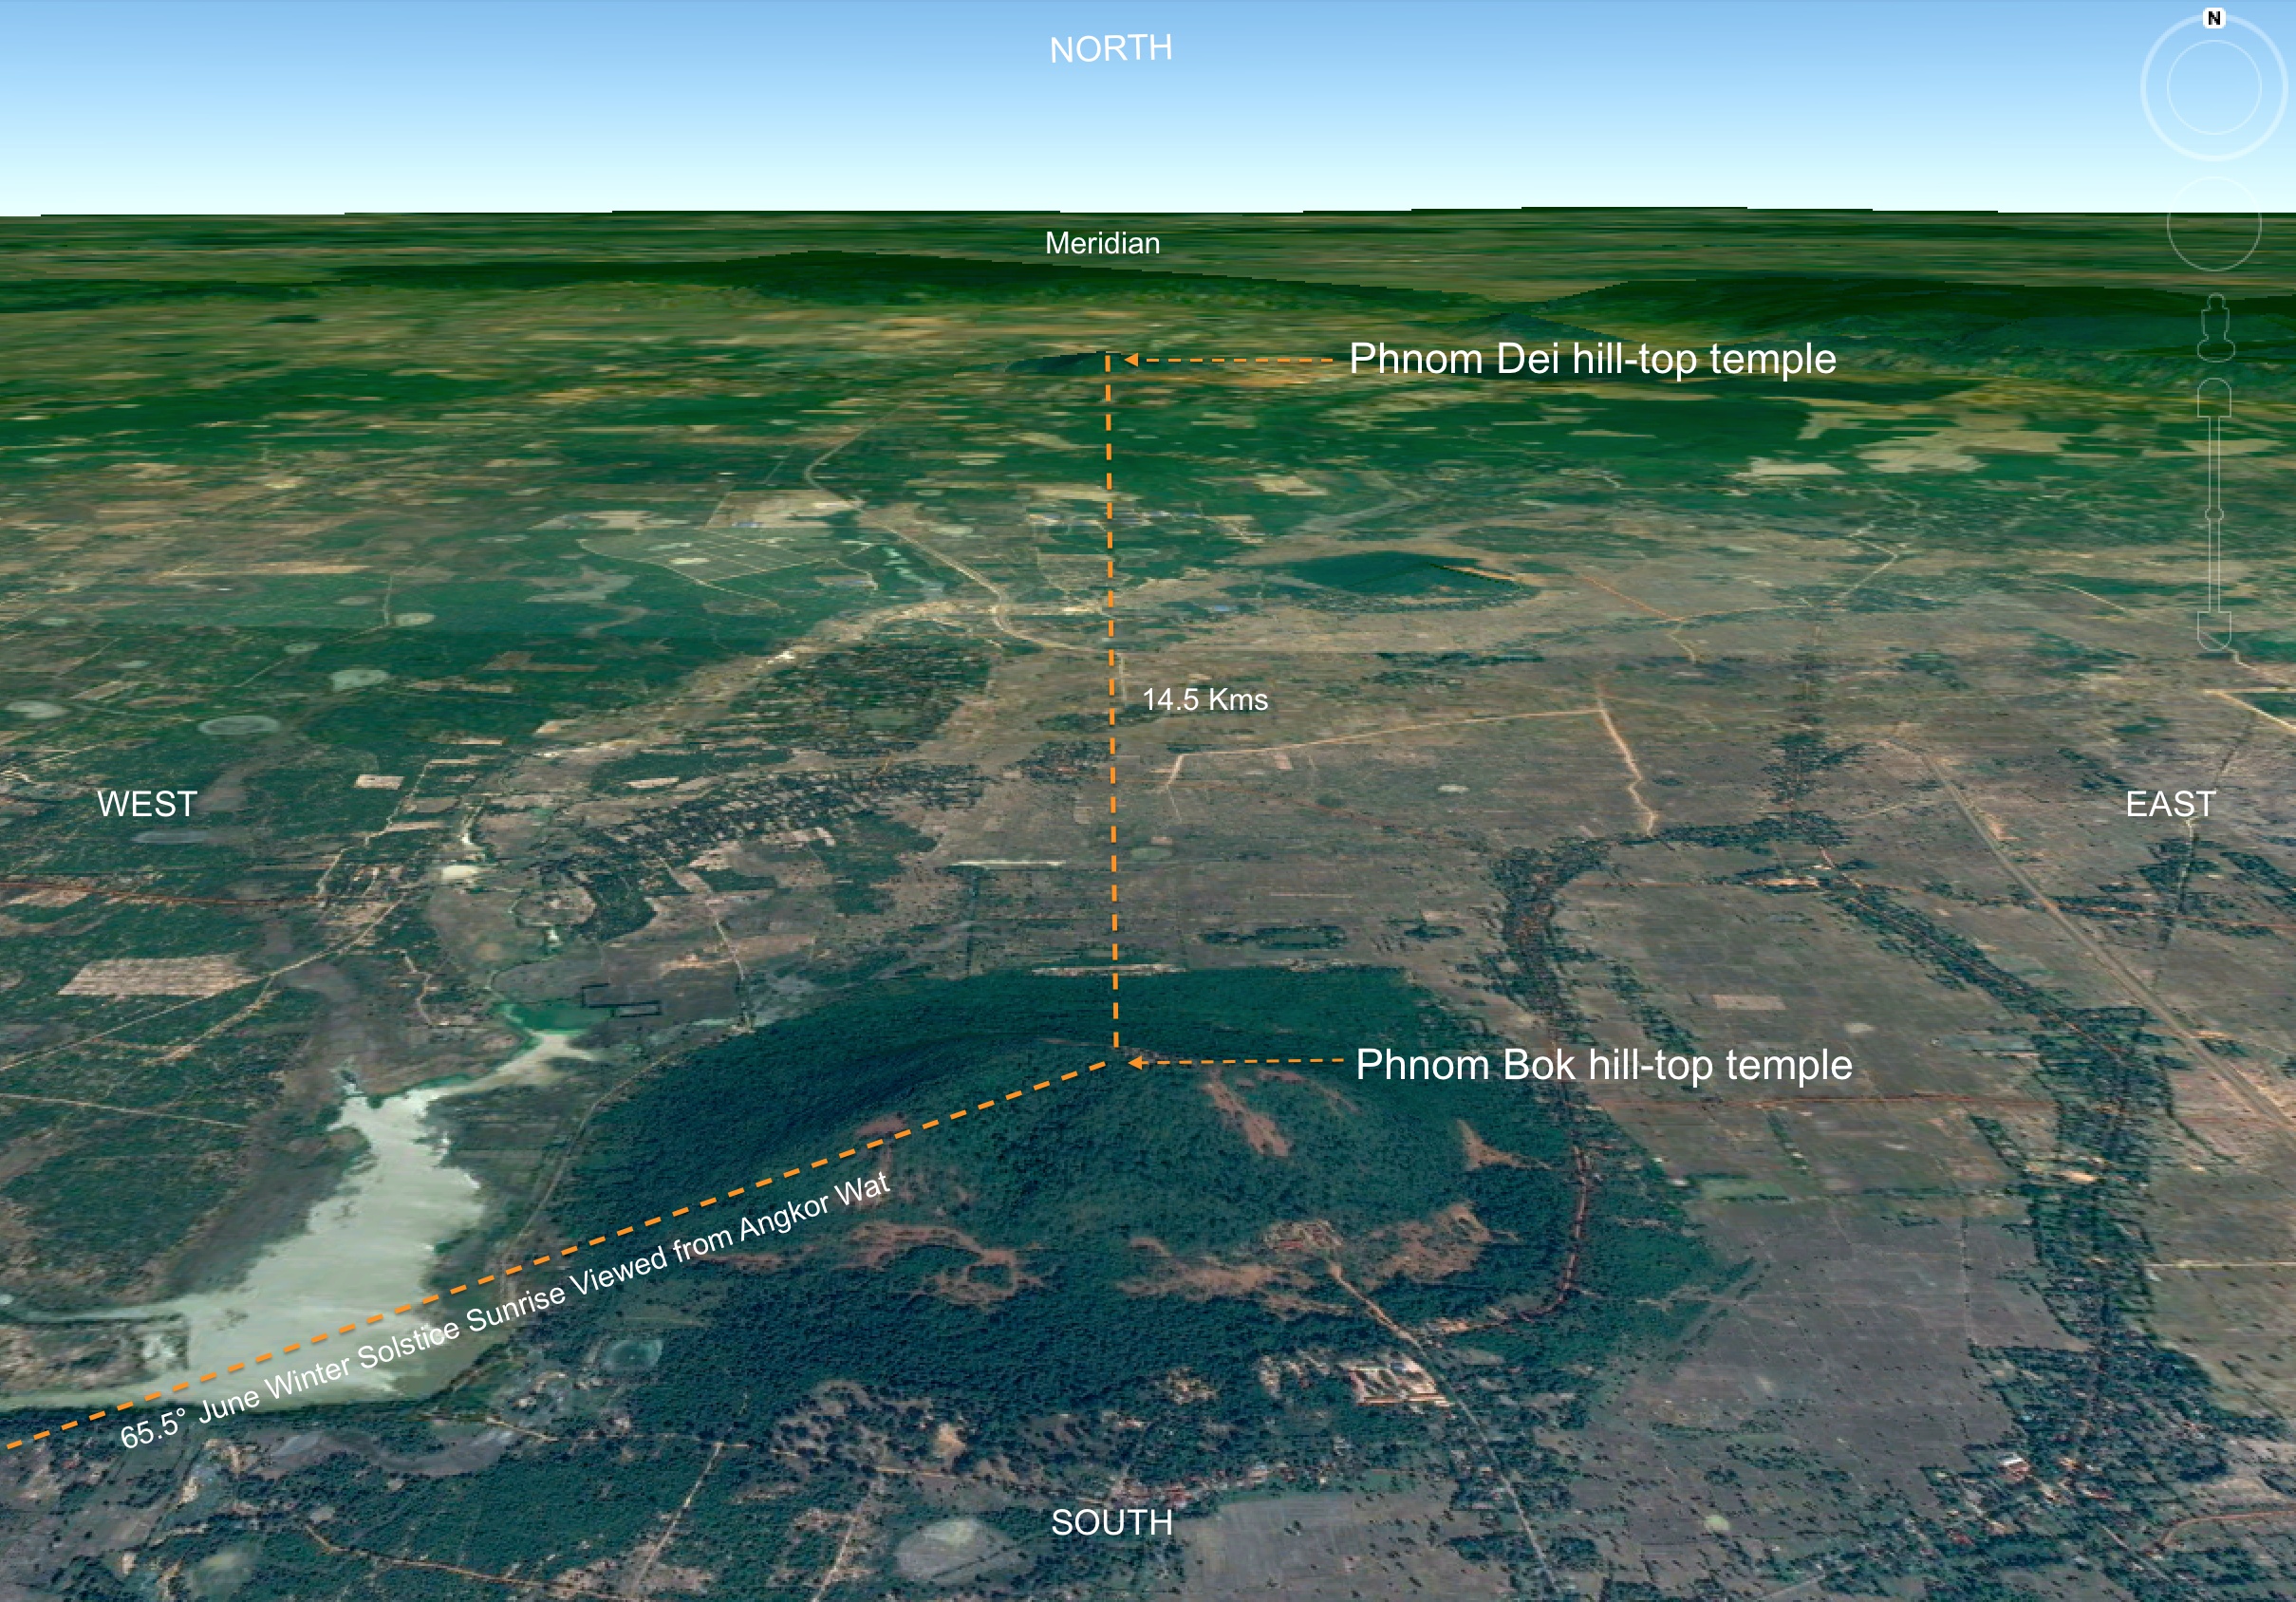 Phnom Dei hill-top temple is 14.5 kilometres north of Phnom Bok hill-top temple, on the same north-south axis (meridian).